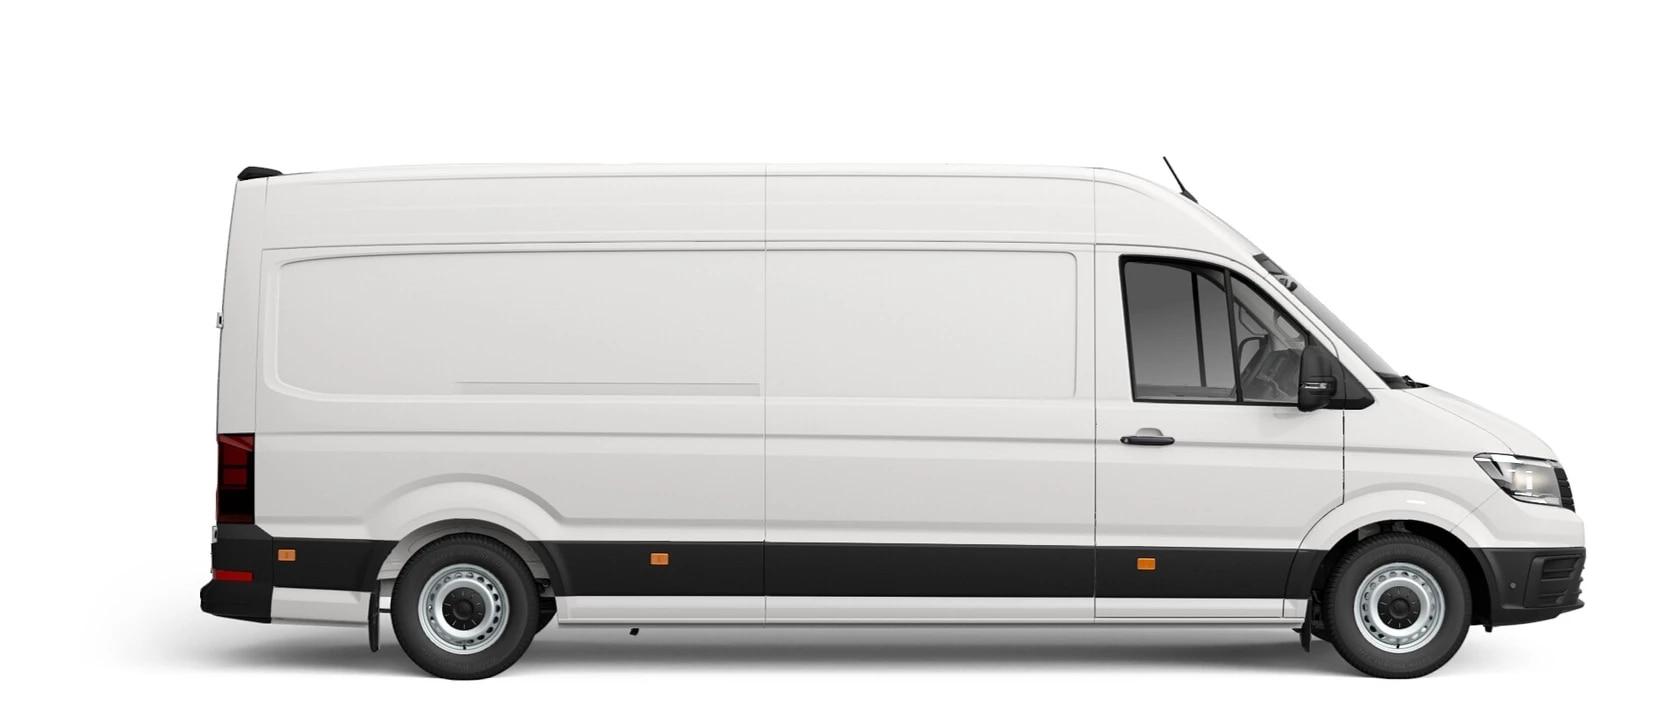 2020 Volkswagen Crafter SY1 35 Runner LWB Van